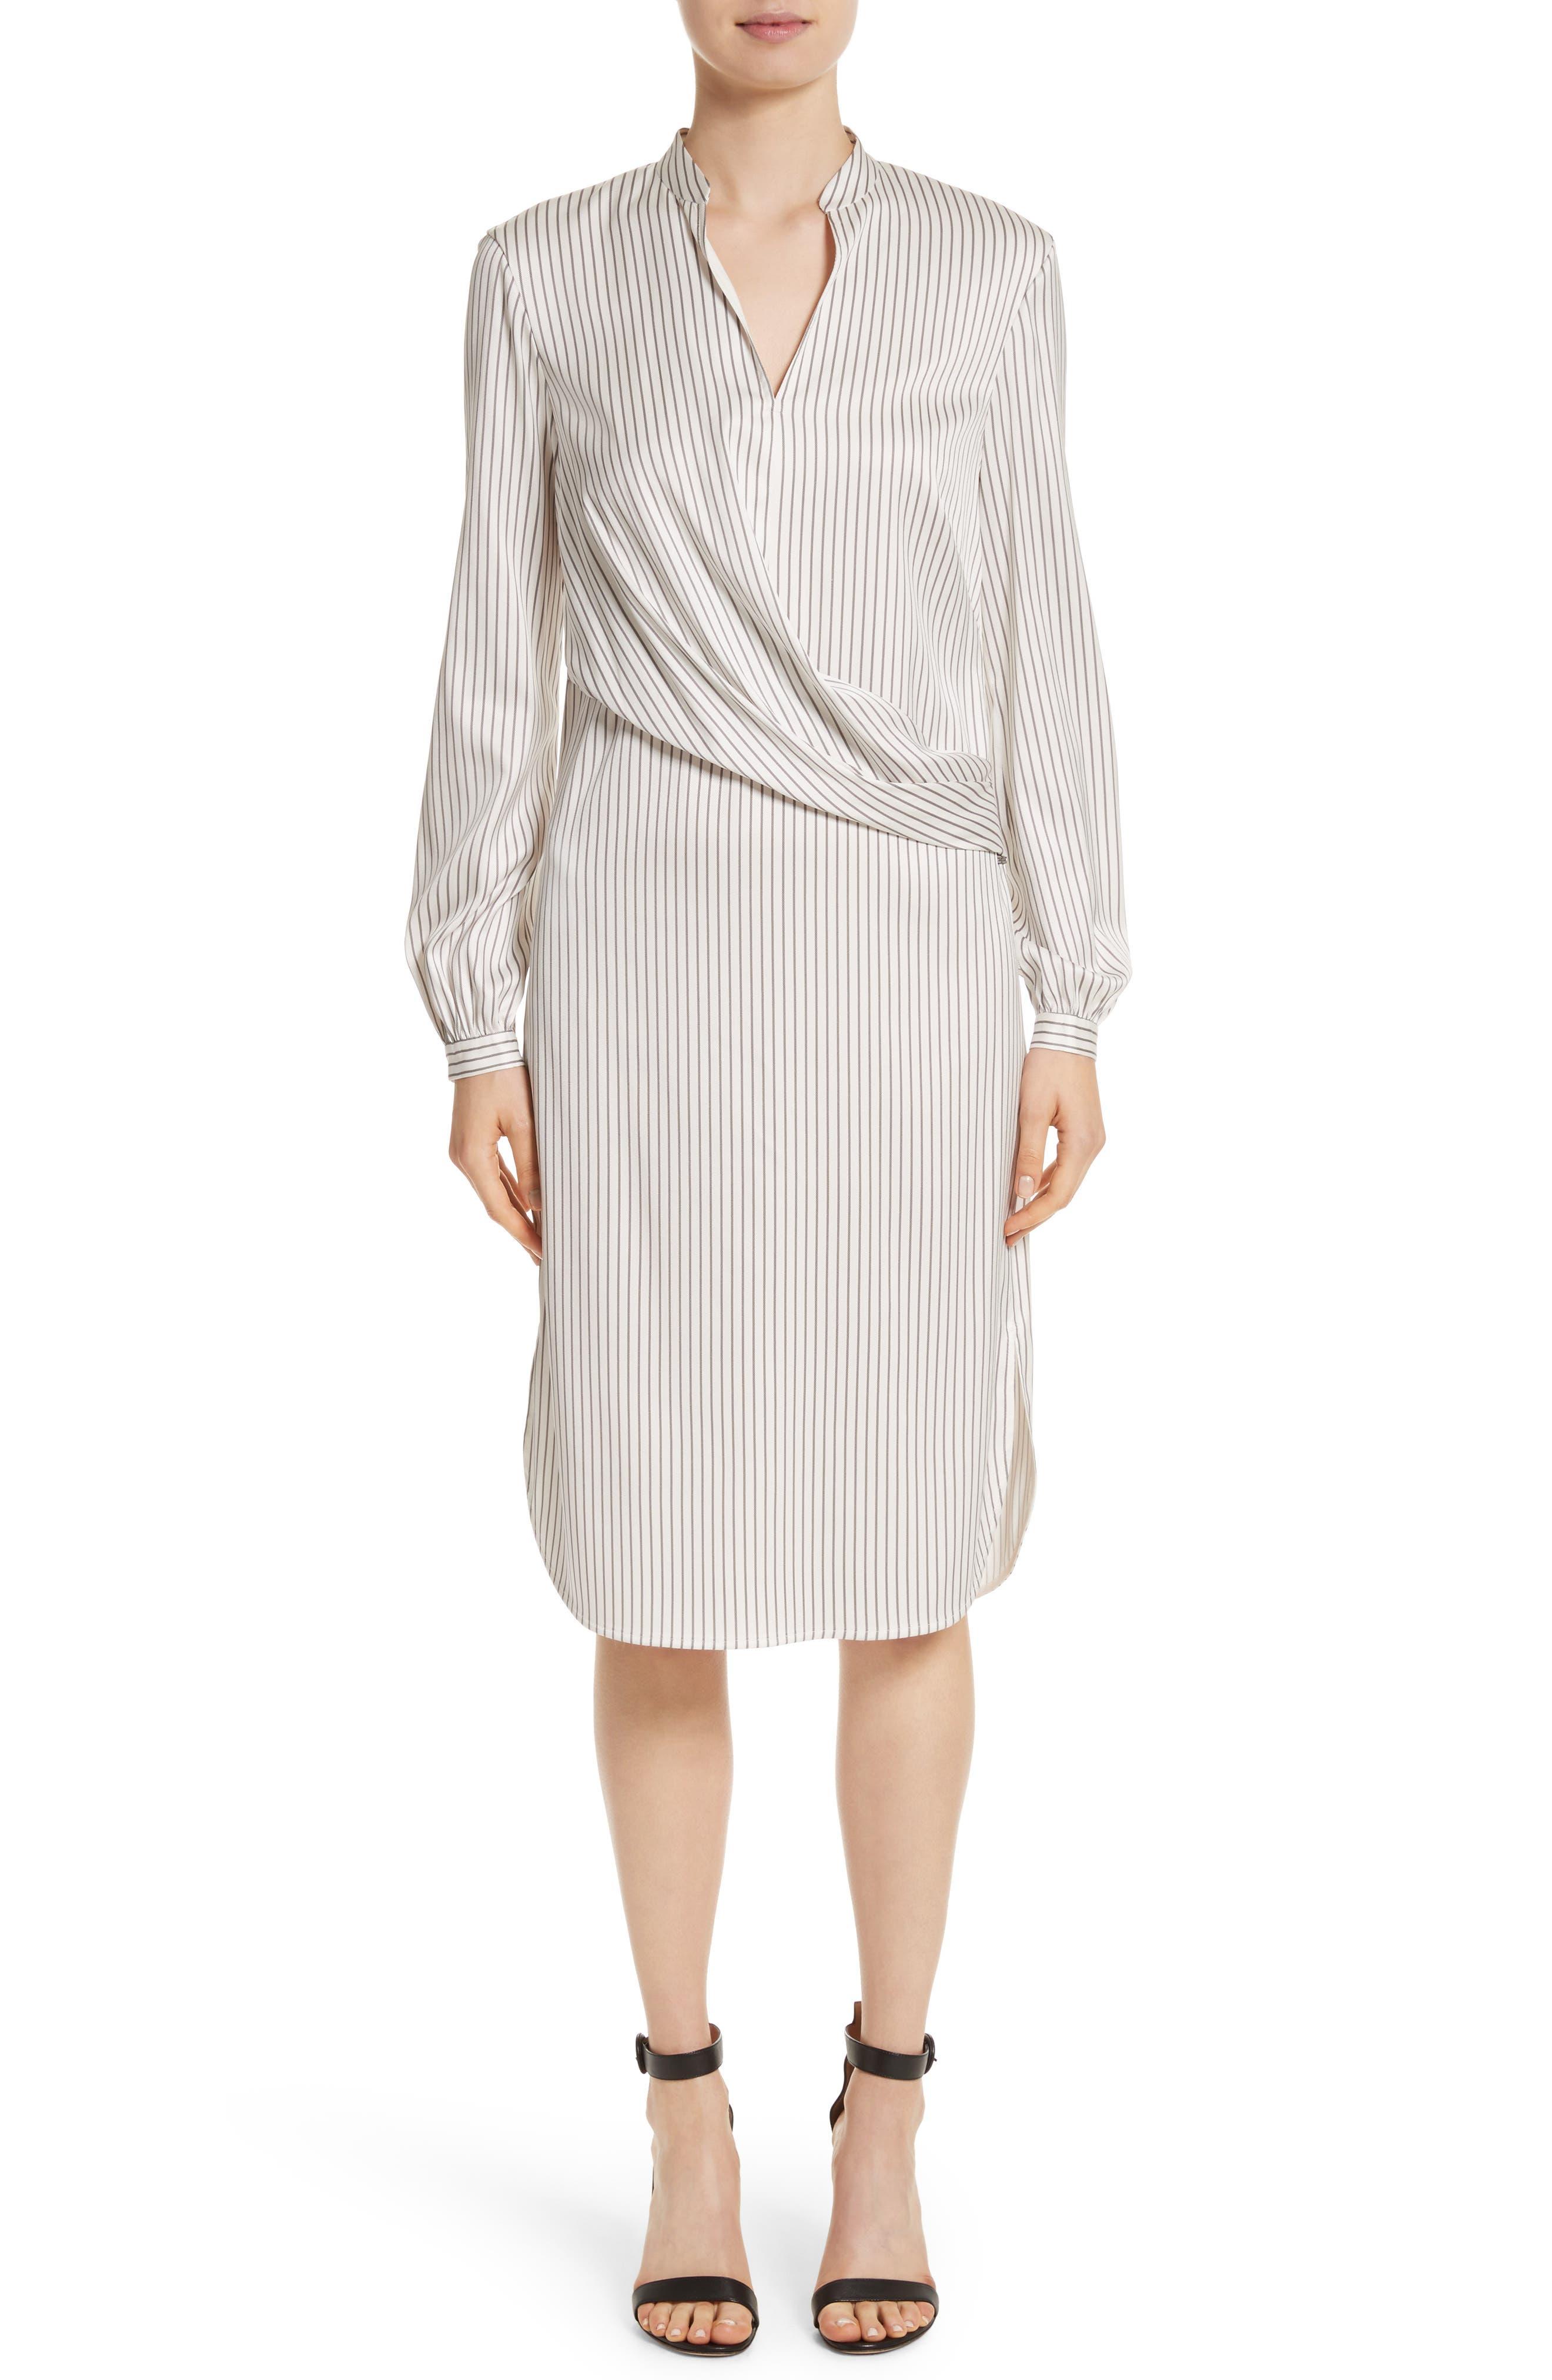 Alternate Image 1 Selected - St. John Collection Vertical Stripe Stretch Silk Dress